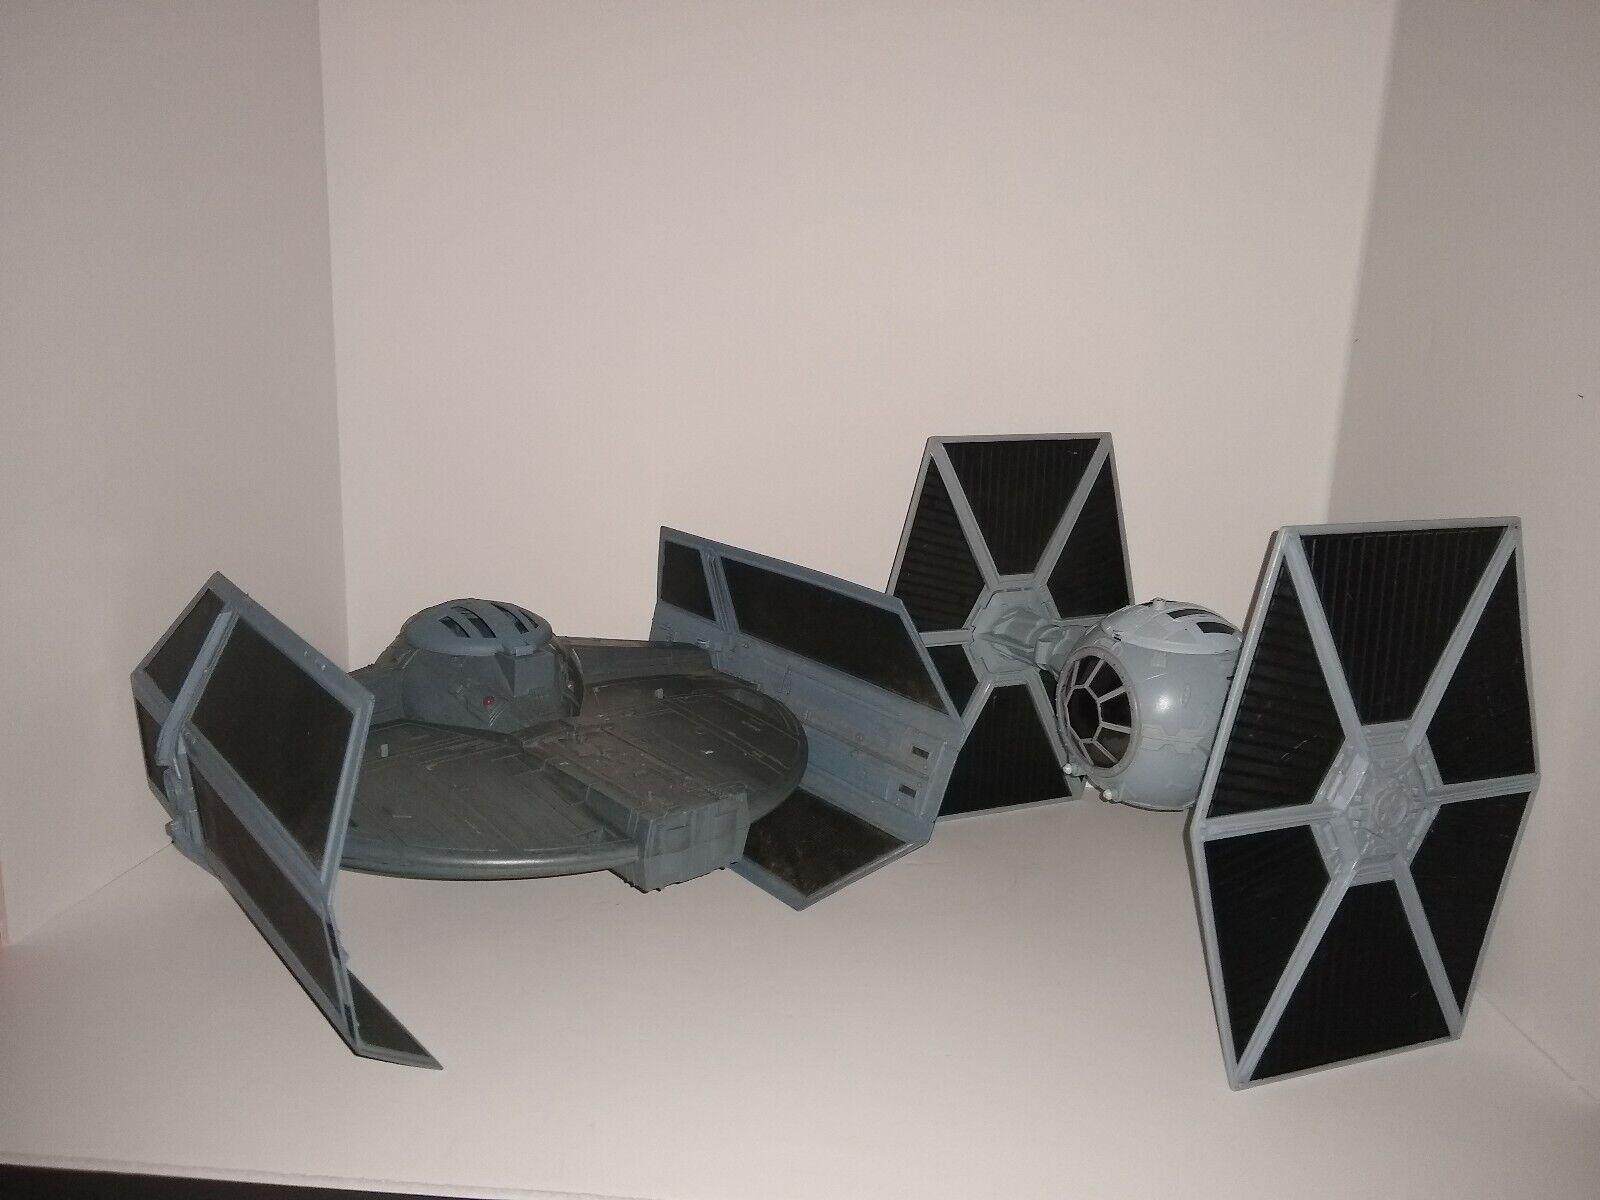 Star Wars Vintage Darth Vader with His 2003 Imperial Tie Fighter & Tie fighter